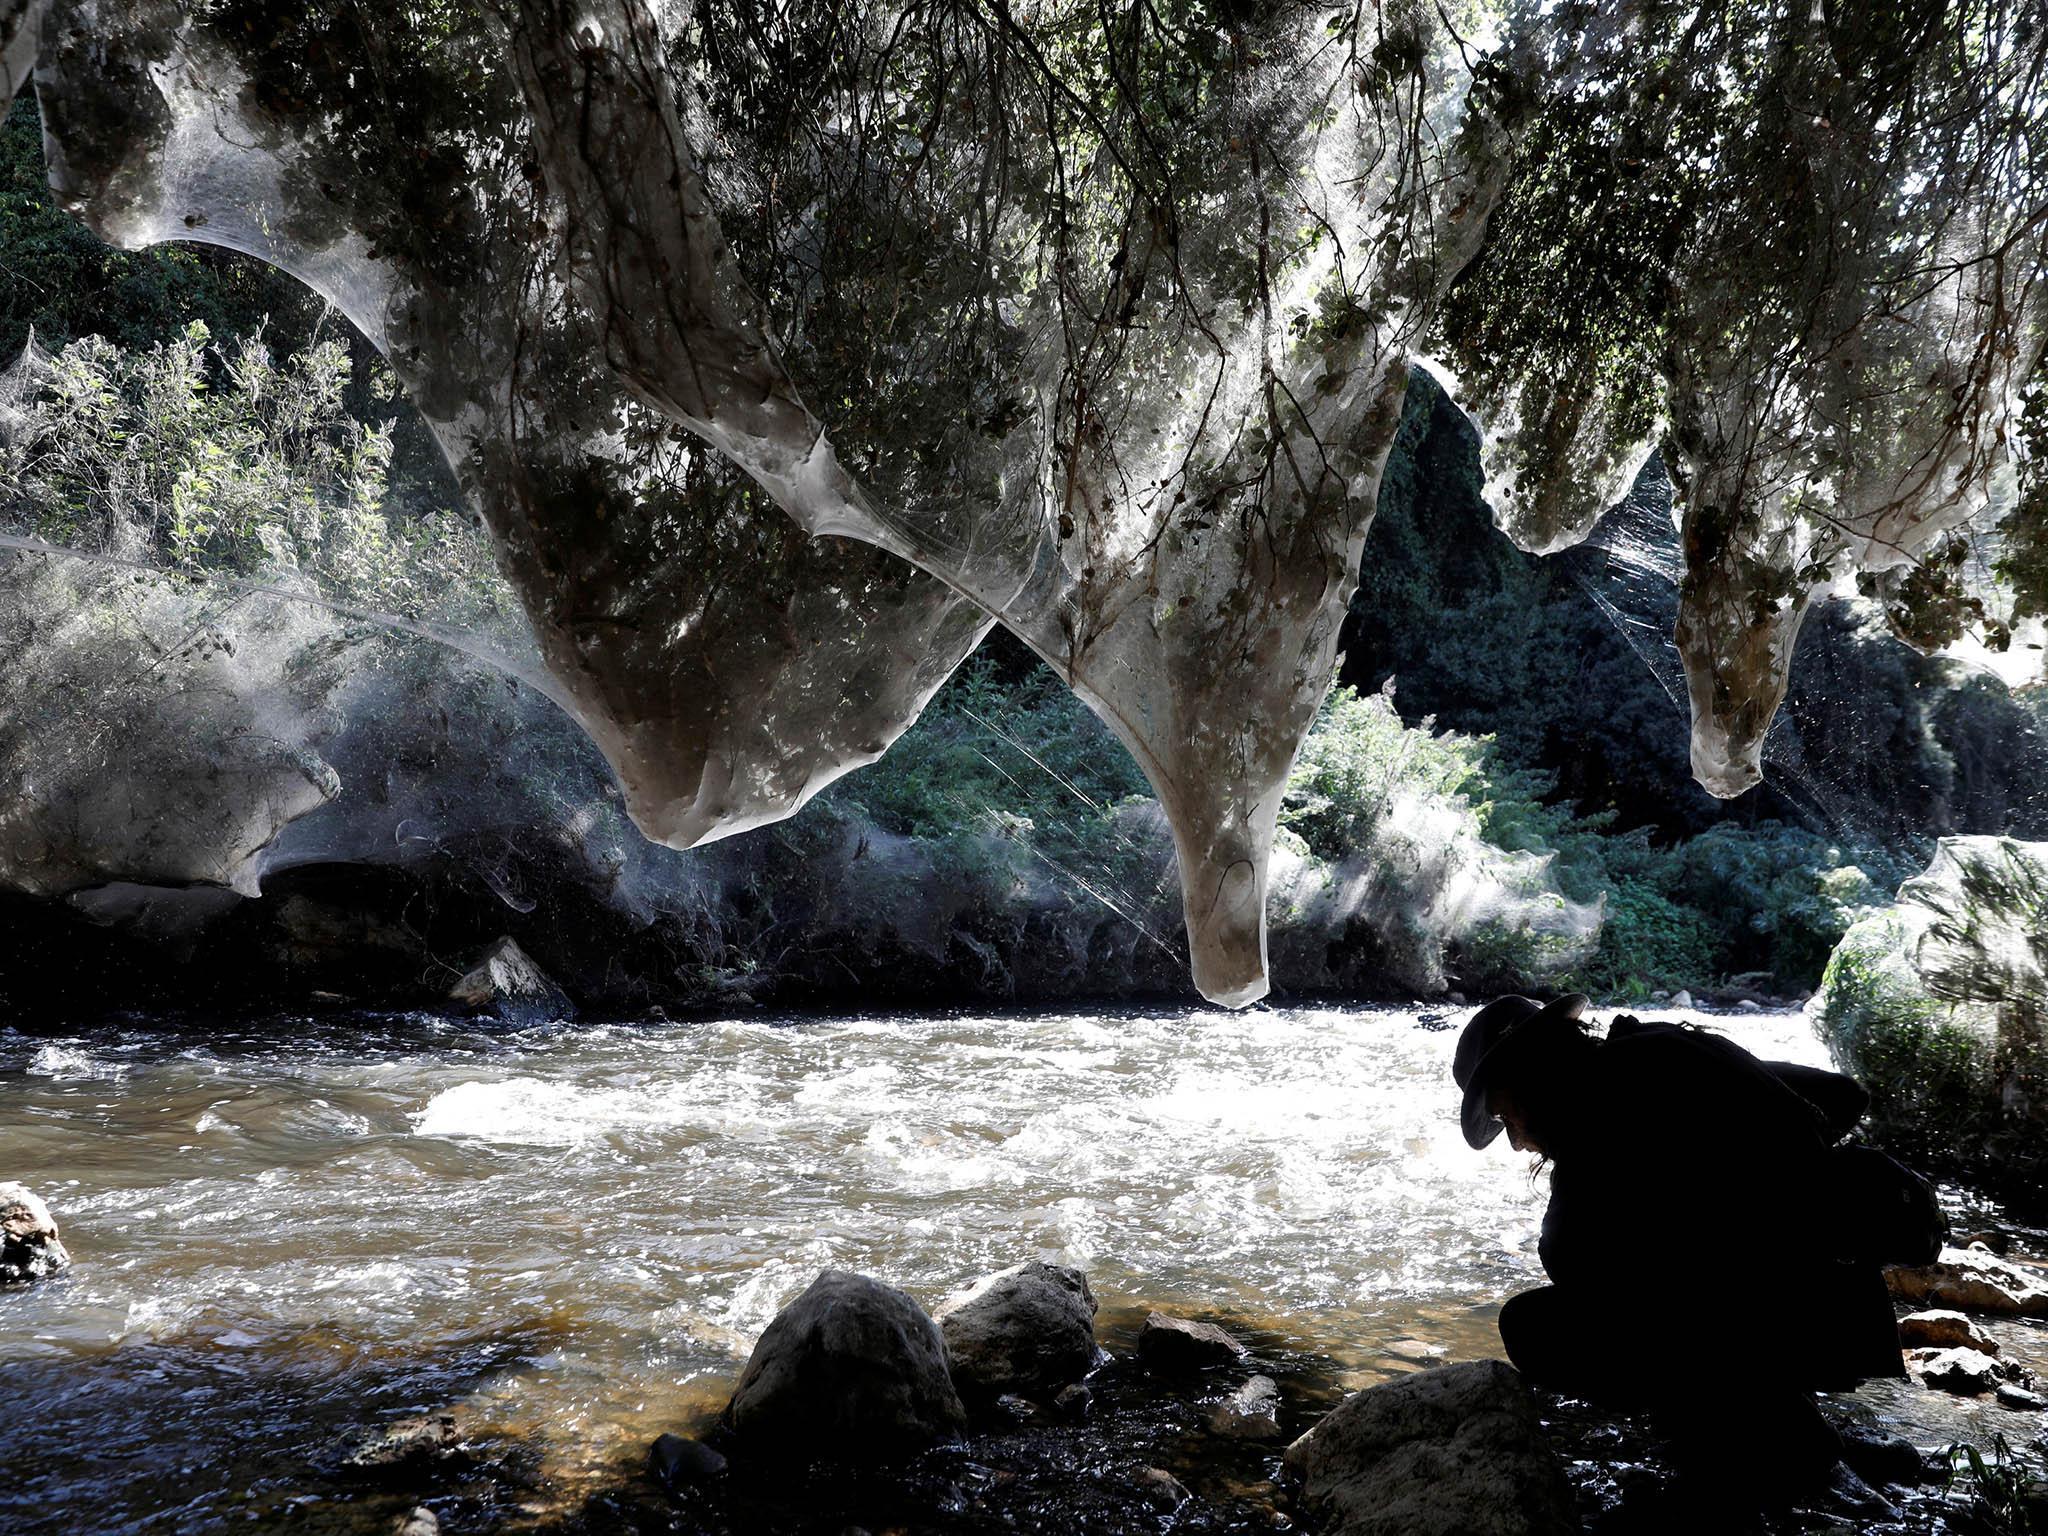 Spellbinding giant spider webs discovered in Jerusalem forest   The Independentindependent_brand_ident_LOGOUntitled